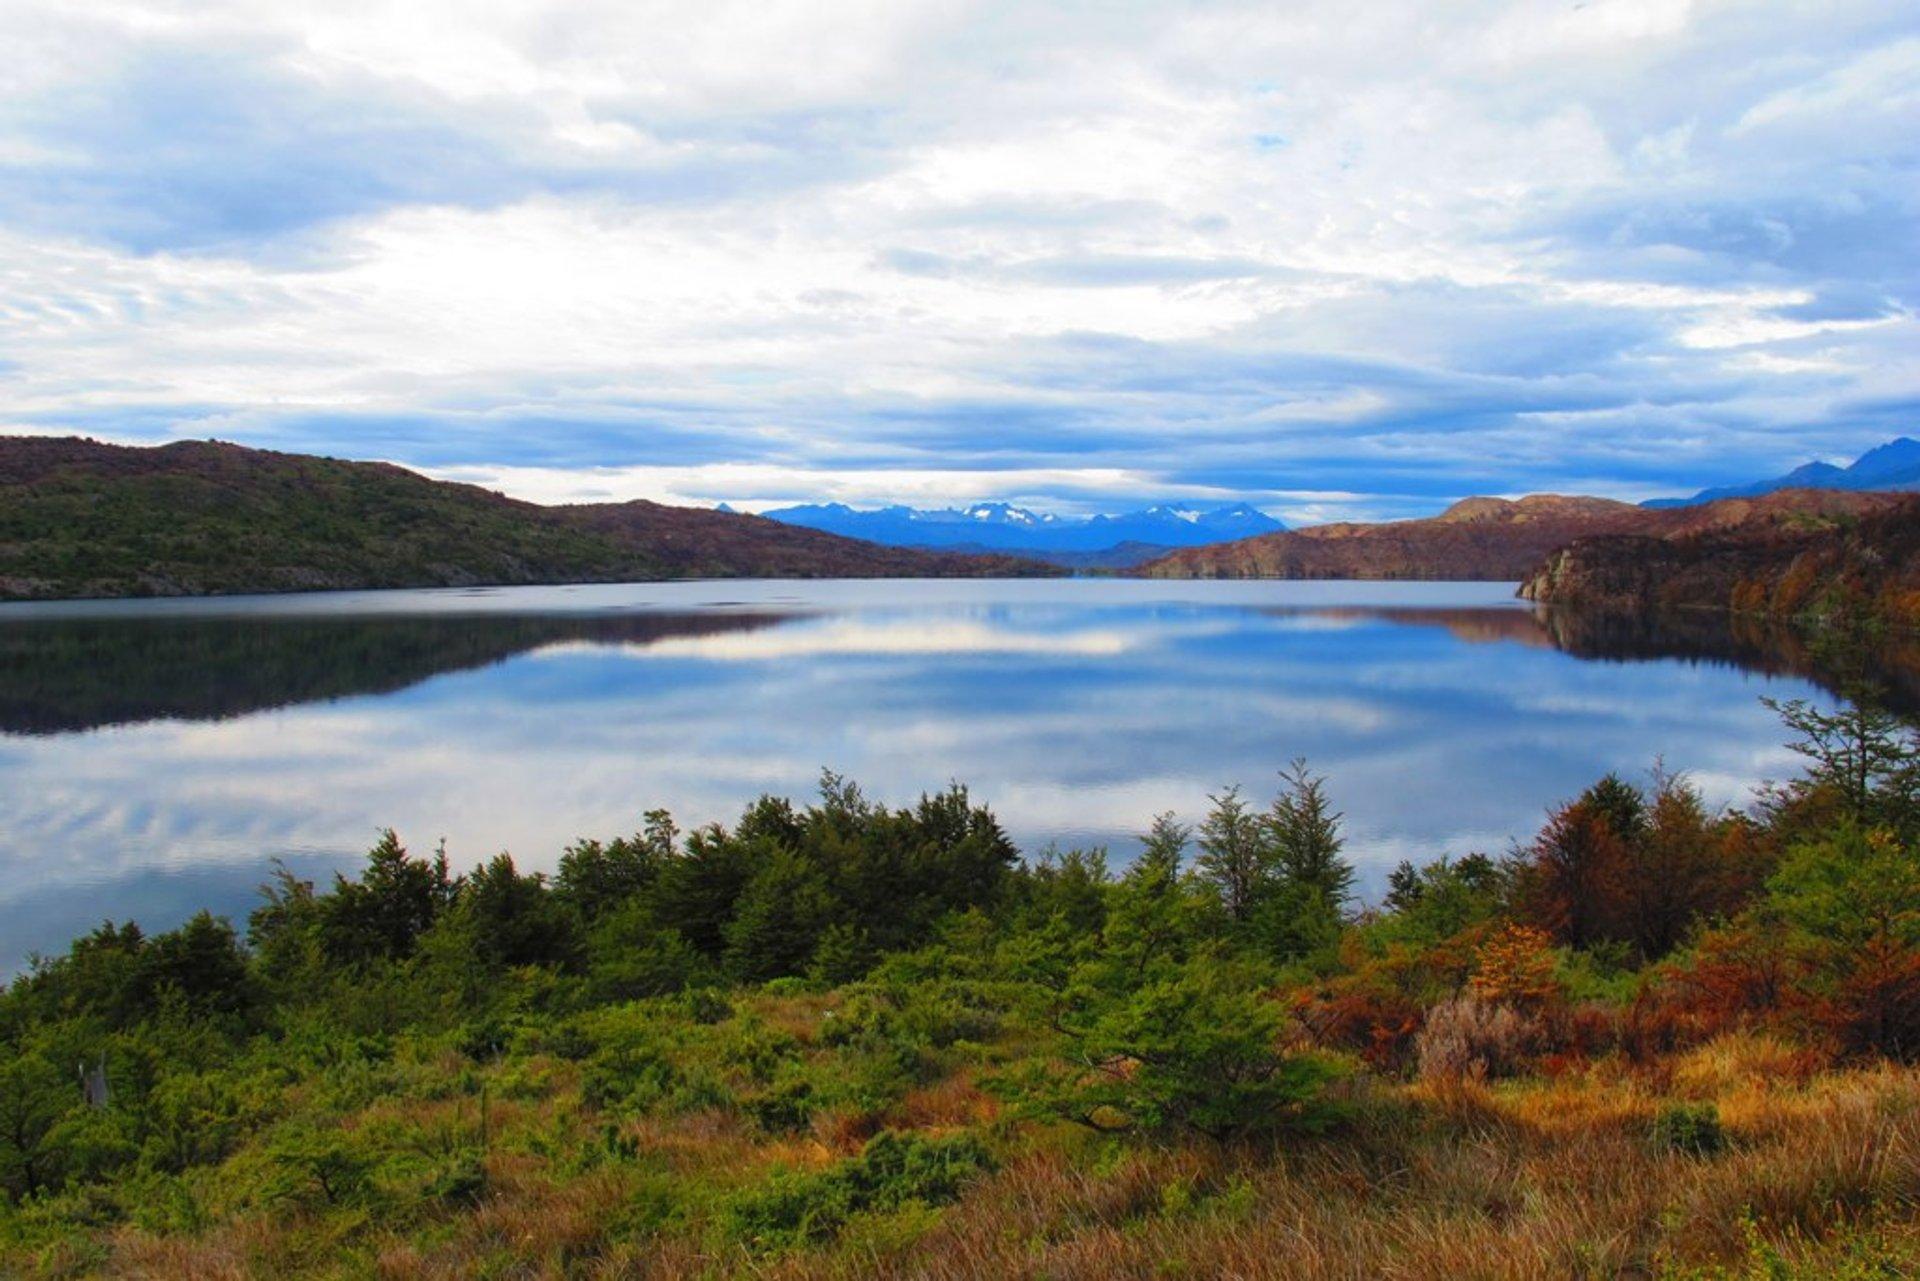 Autumn Colours in Chile - Best Season 2020